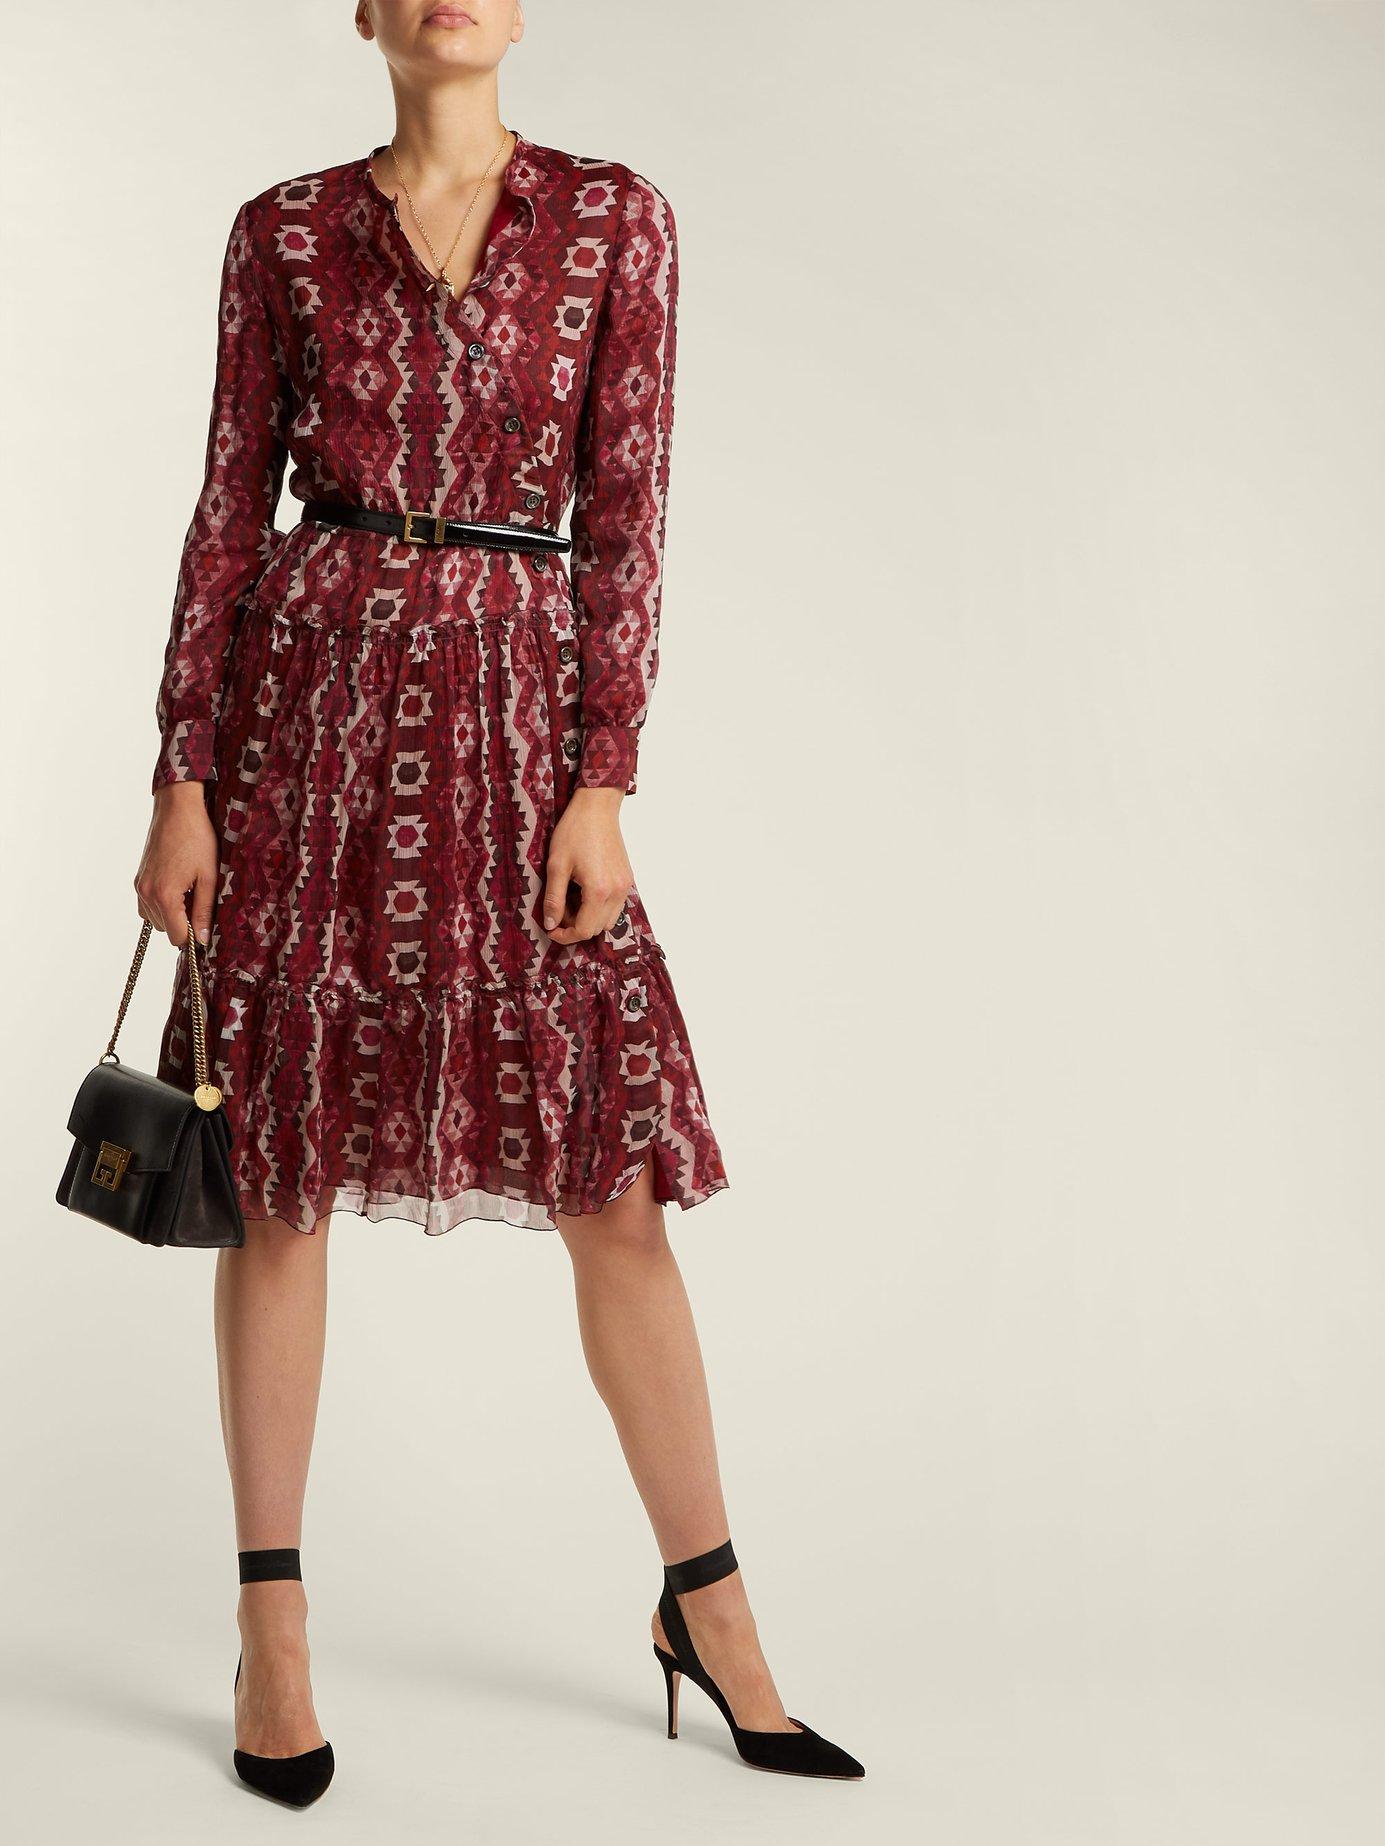 Agadir chiffon dress by Altuzarra